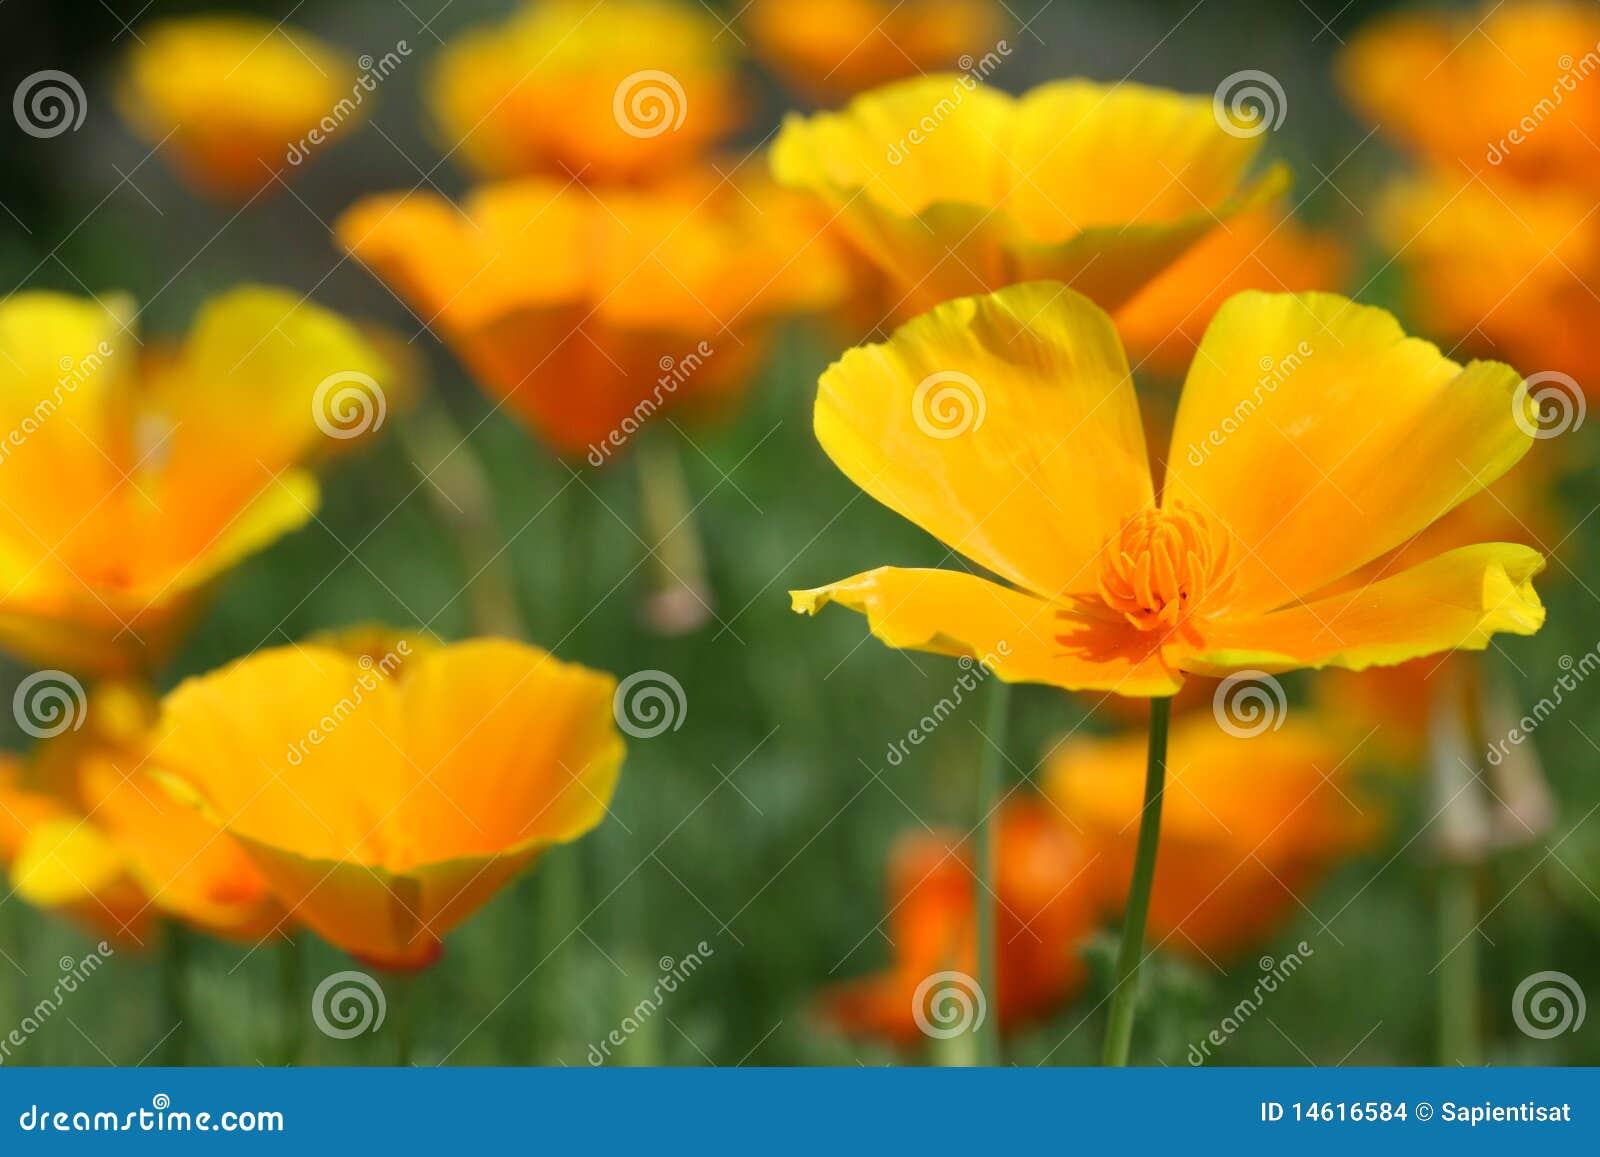 Papaveri californiani nel giardino fotografia stock - Il sole nel giardino ...